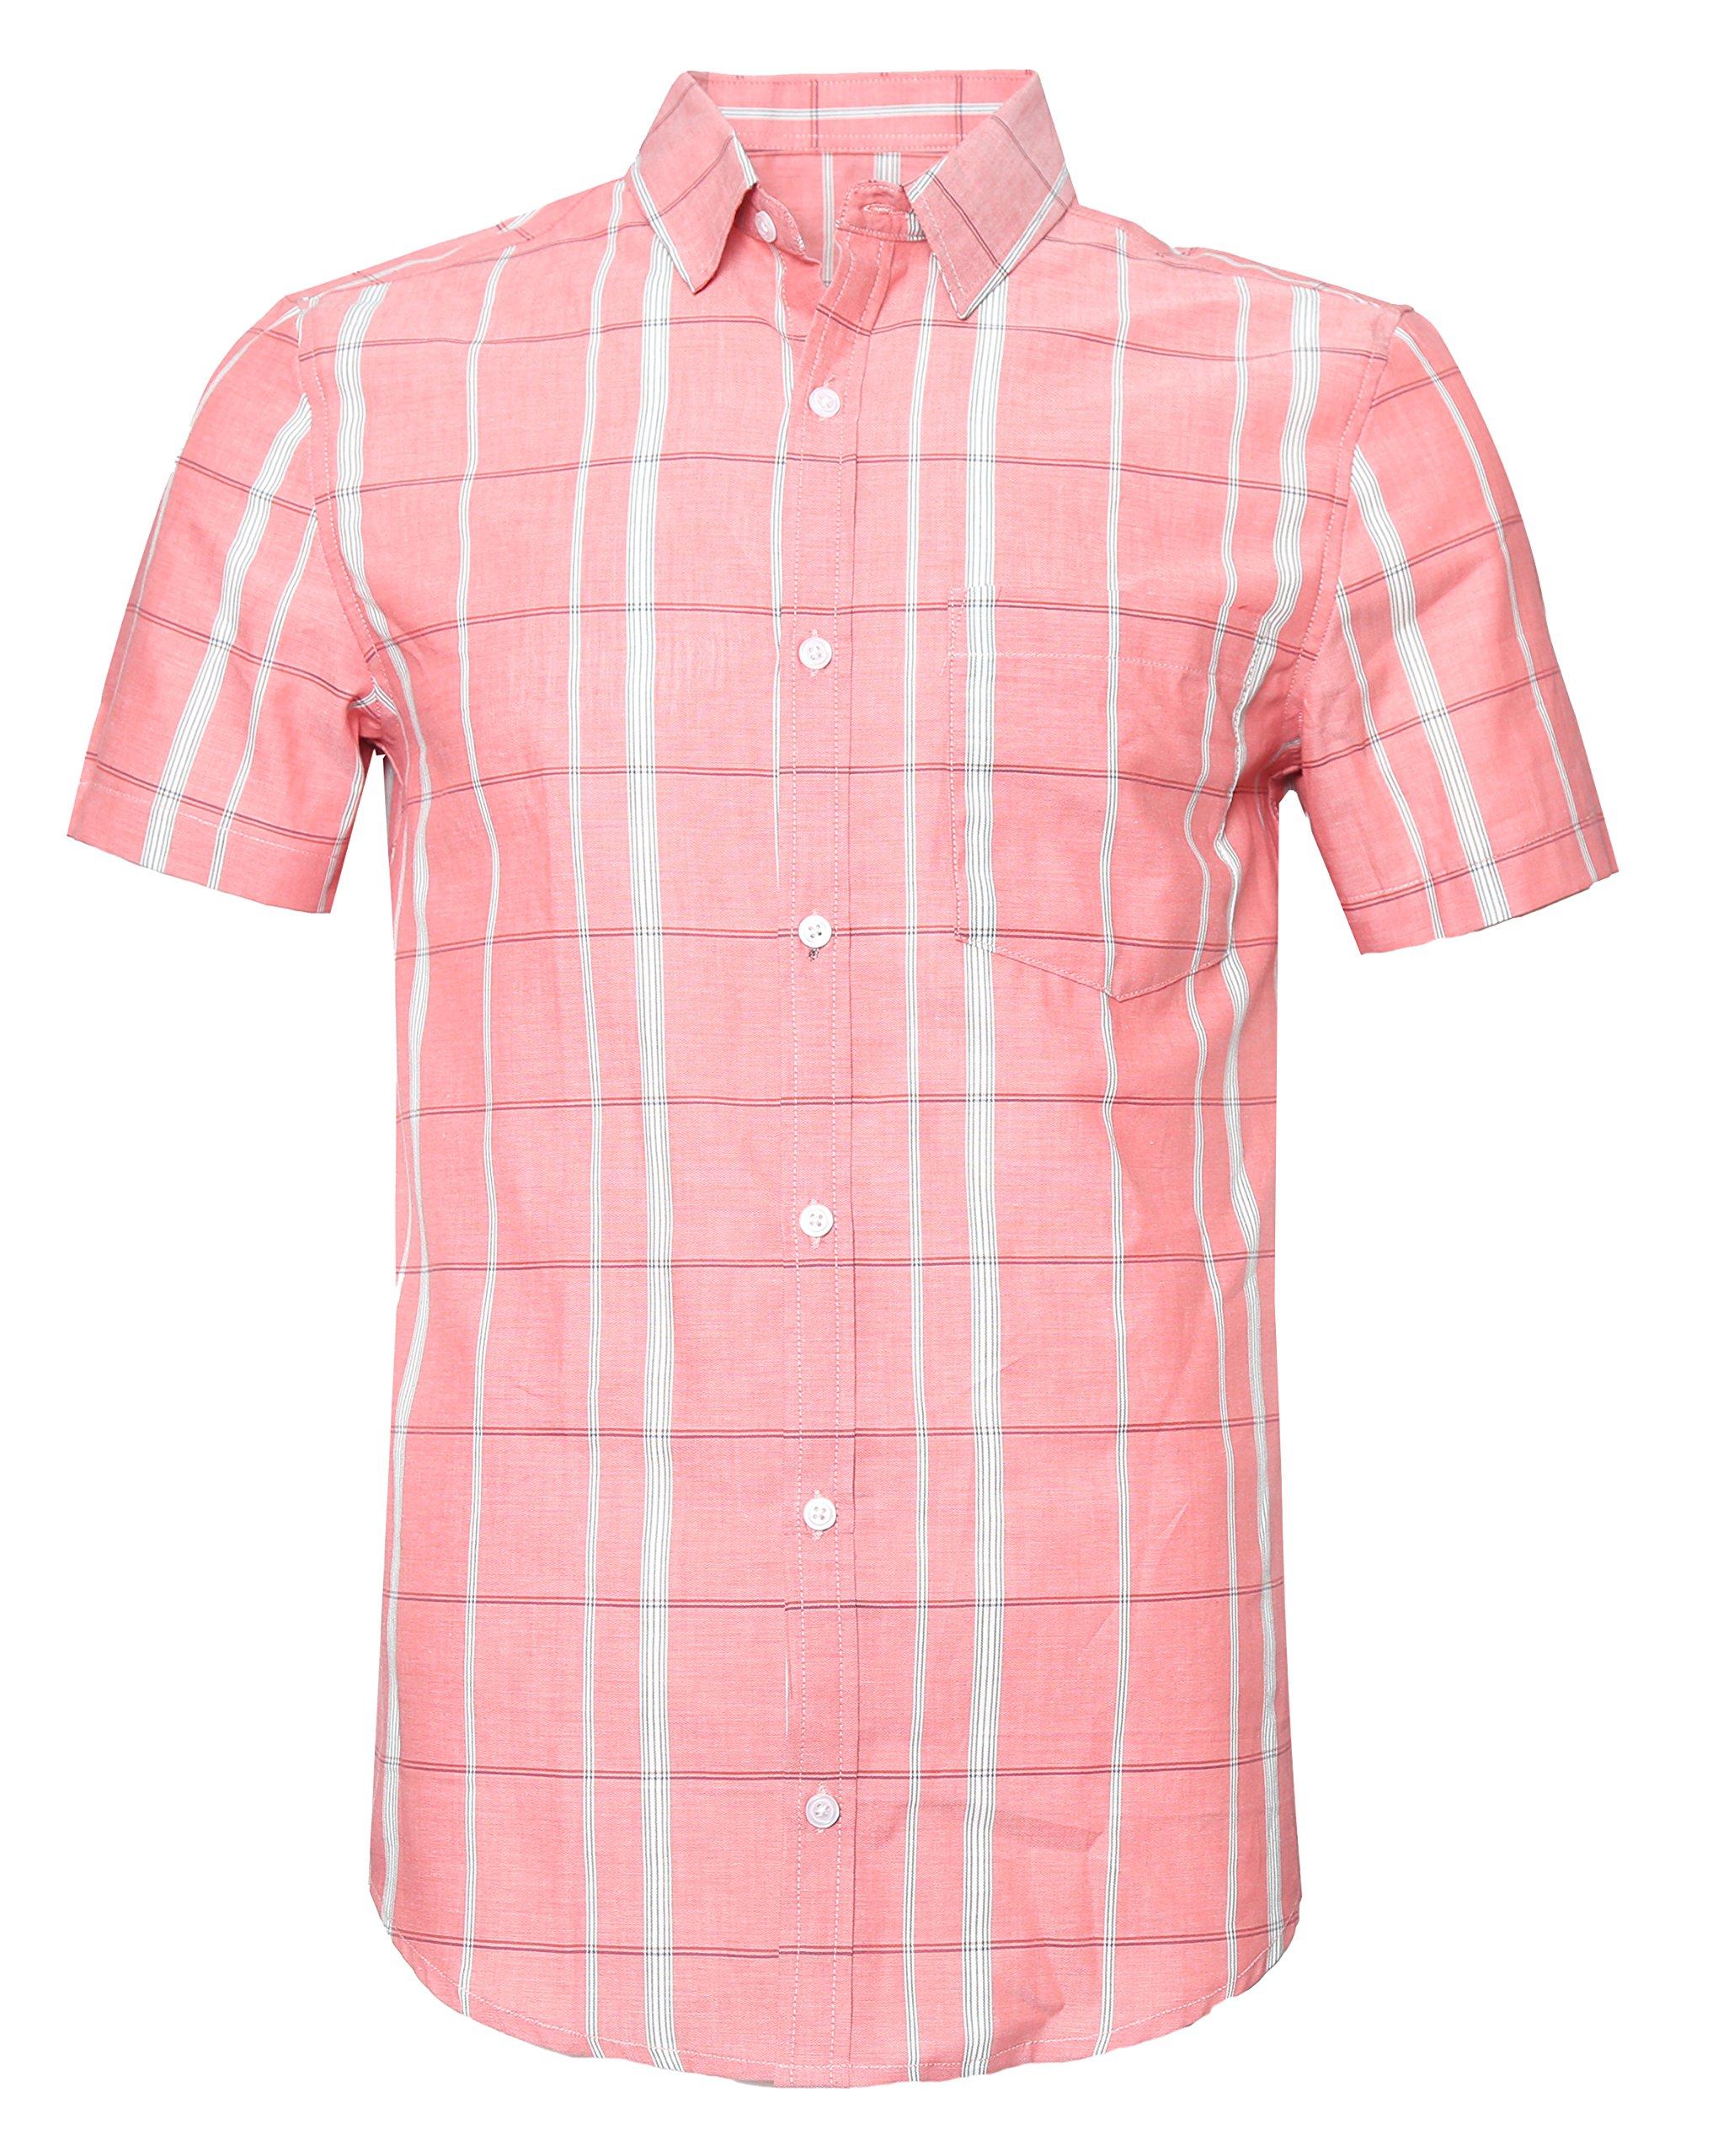 SOOPO Men's Slim-Fit Short Sleeve Plaid Twill Shirt Pink XXXL